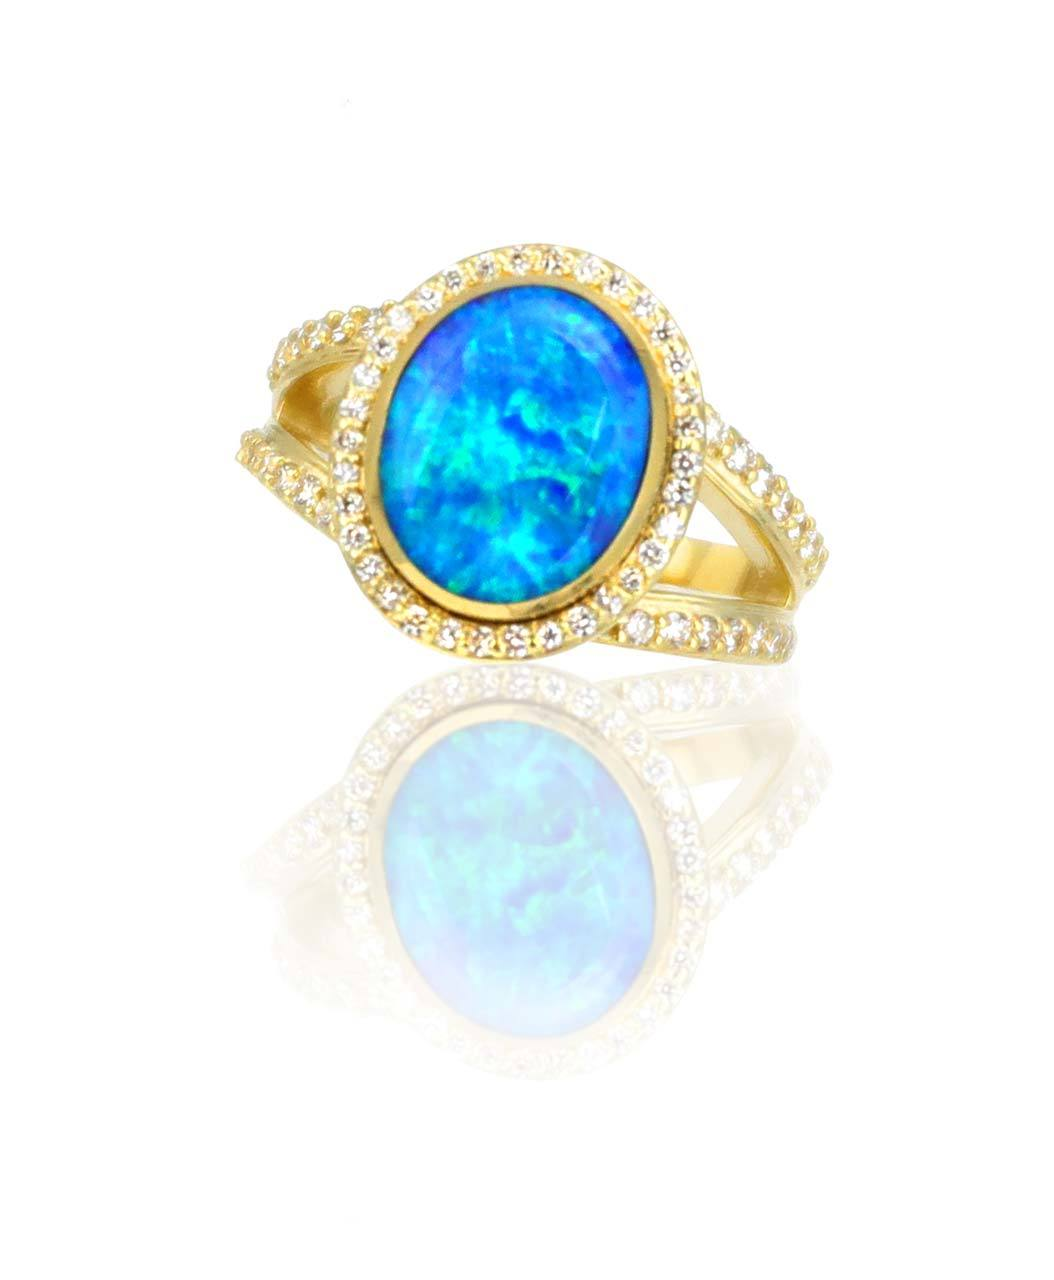 Maverick's 14K Blue Opal Ring With Diamond Halo